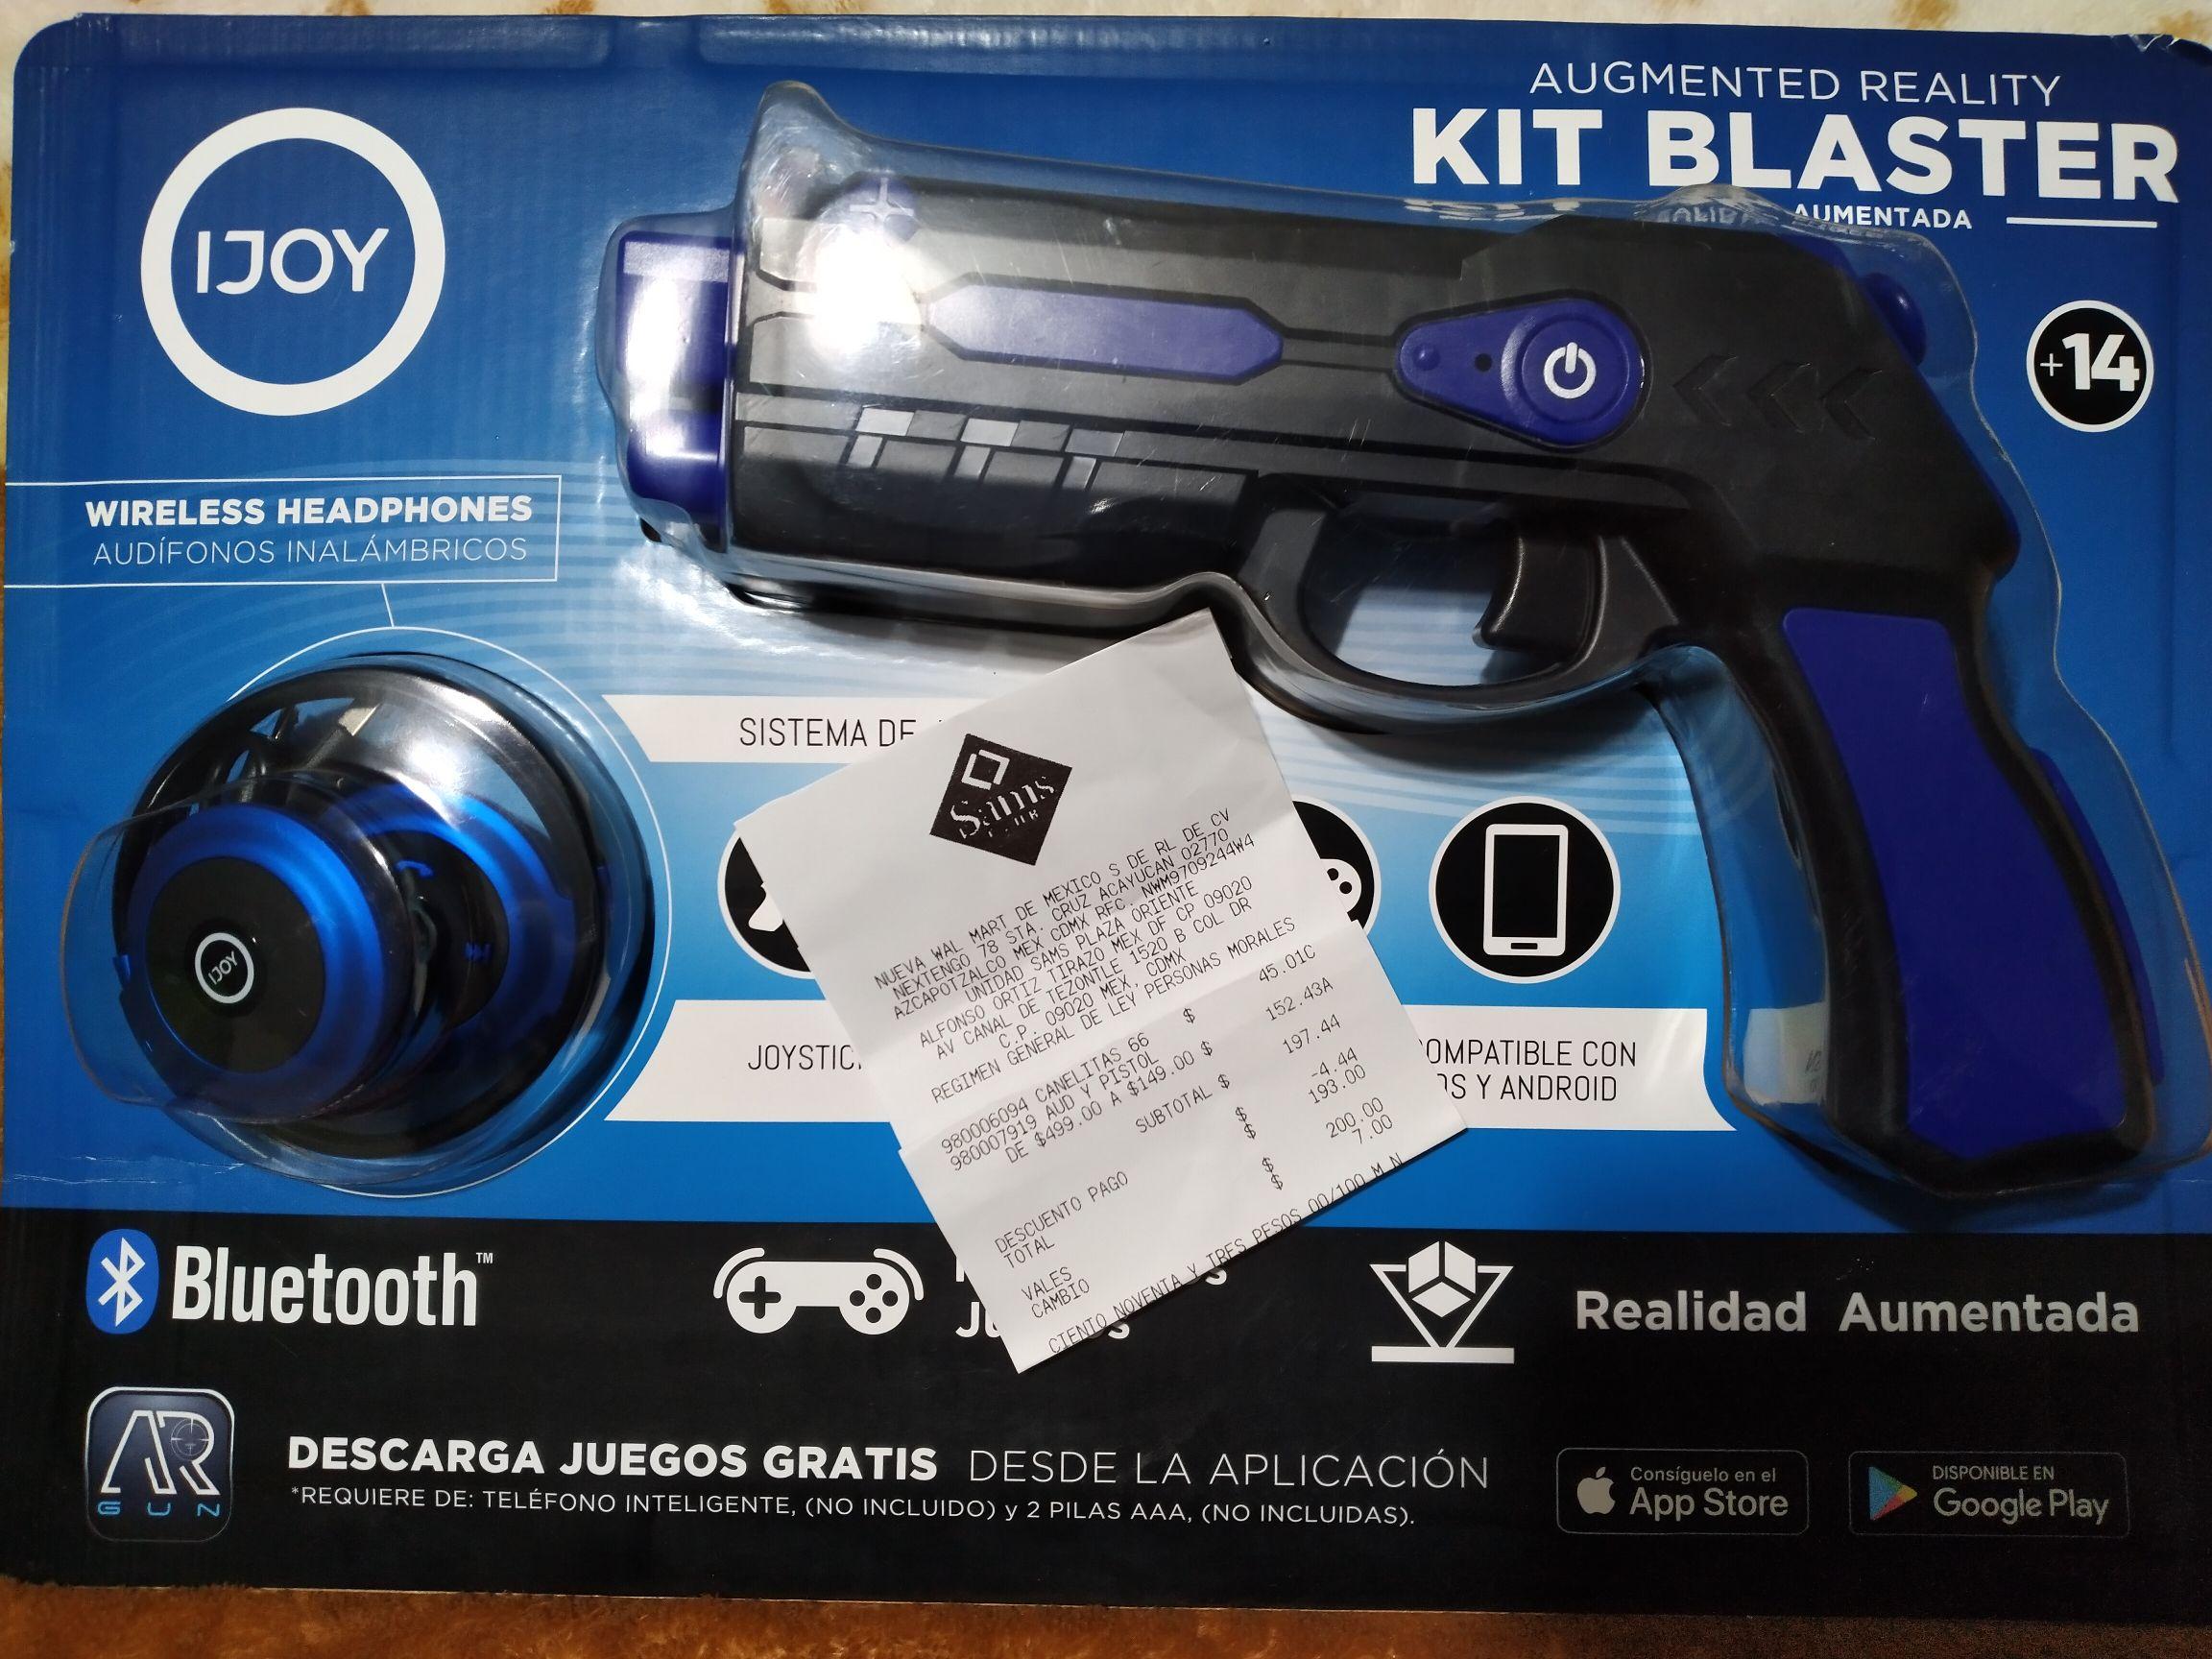 Sam's Club: kit blaster realidad aumentada.